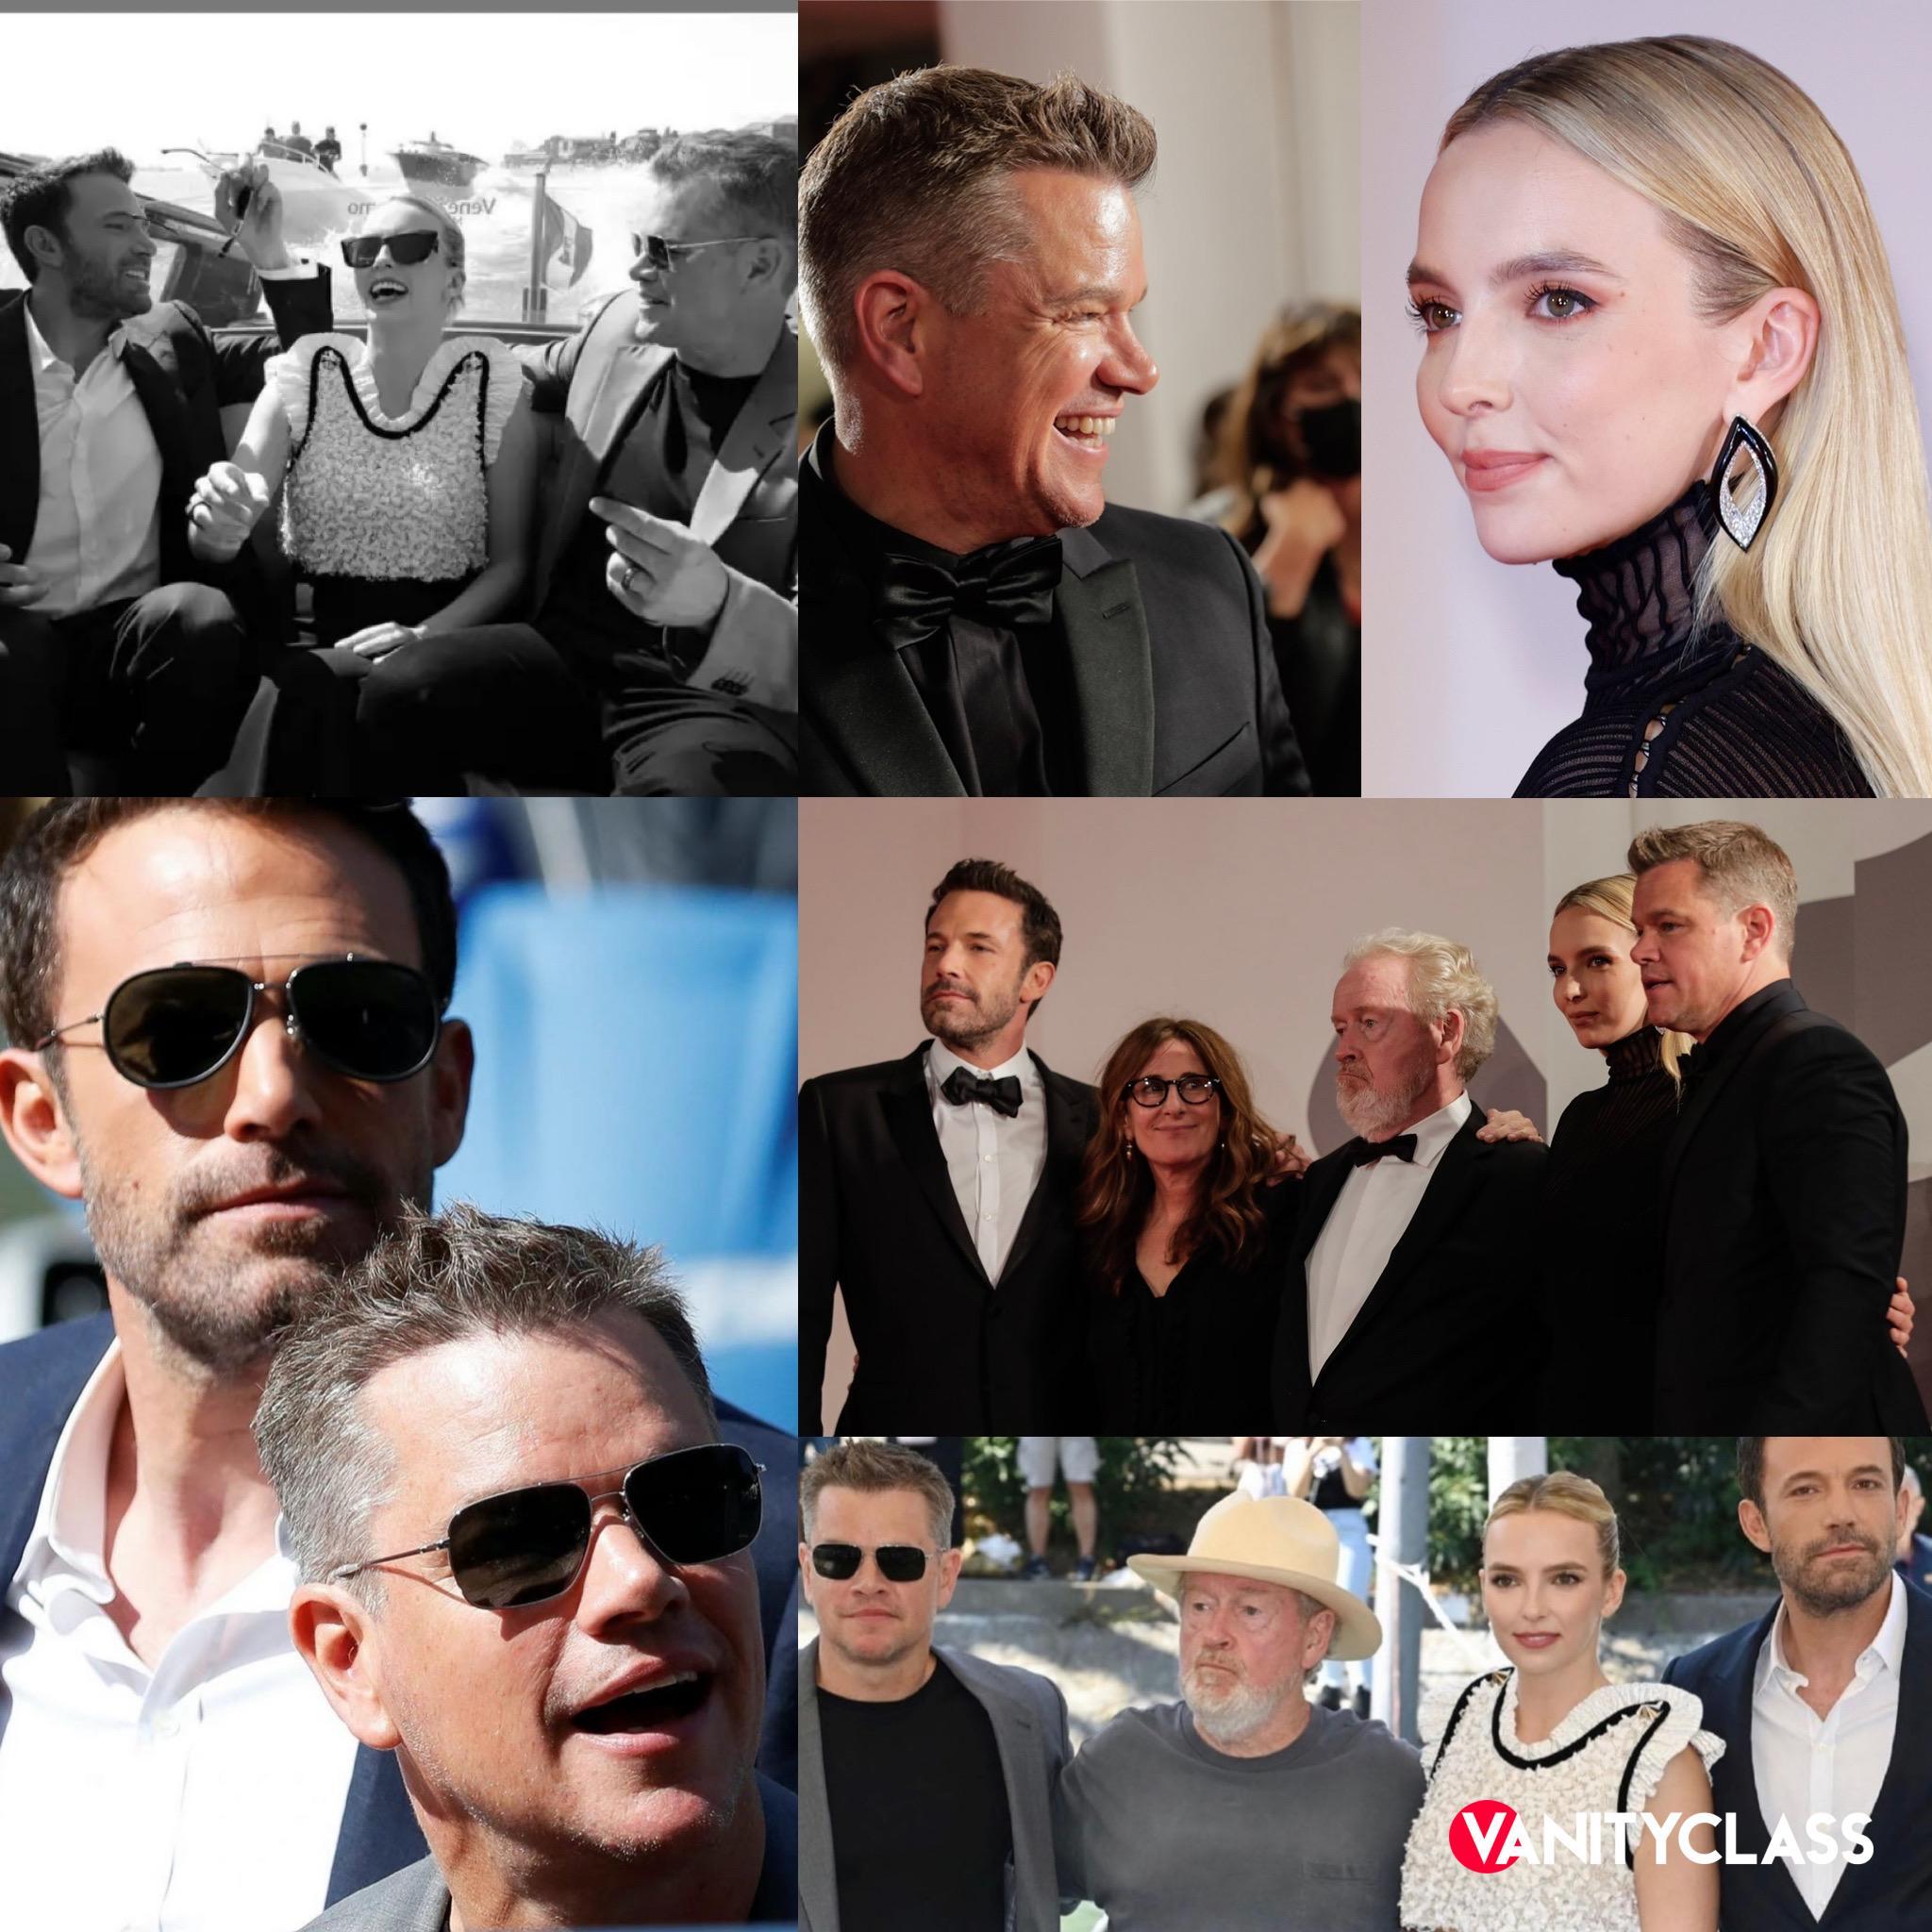 Ben (nifer) Affleck e Matt Damon: bentornati golden guys